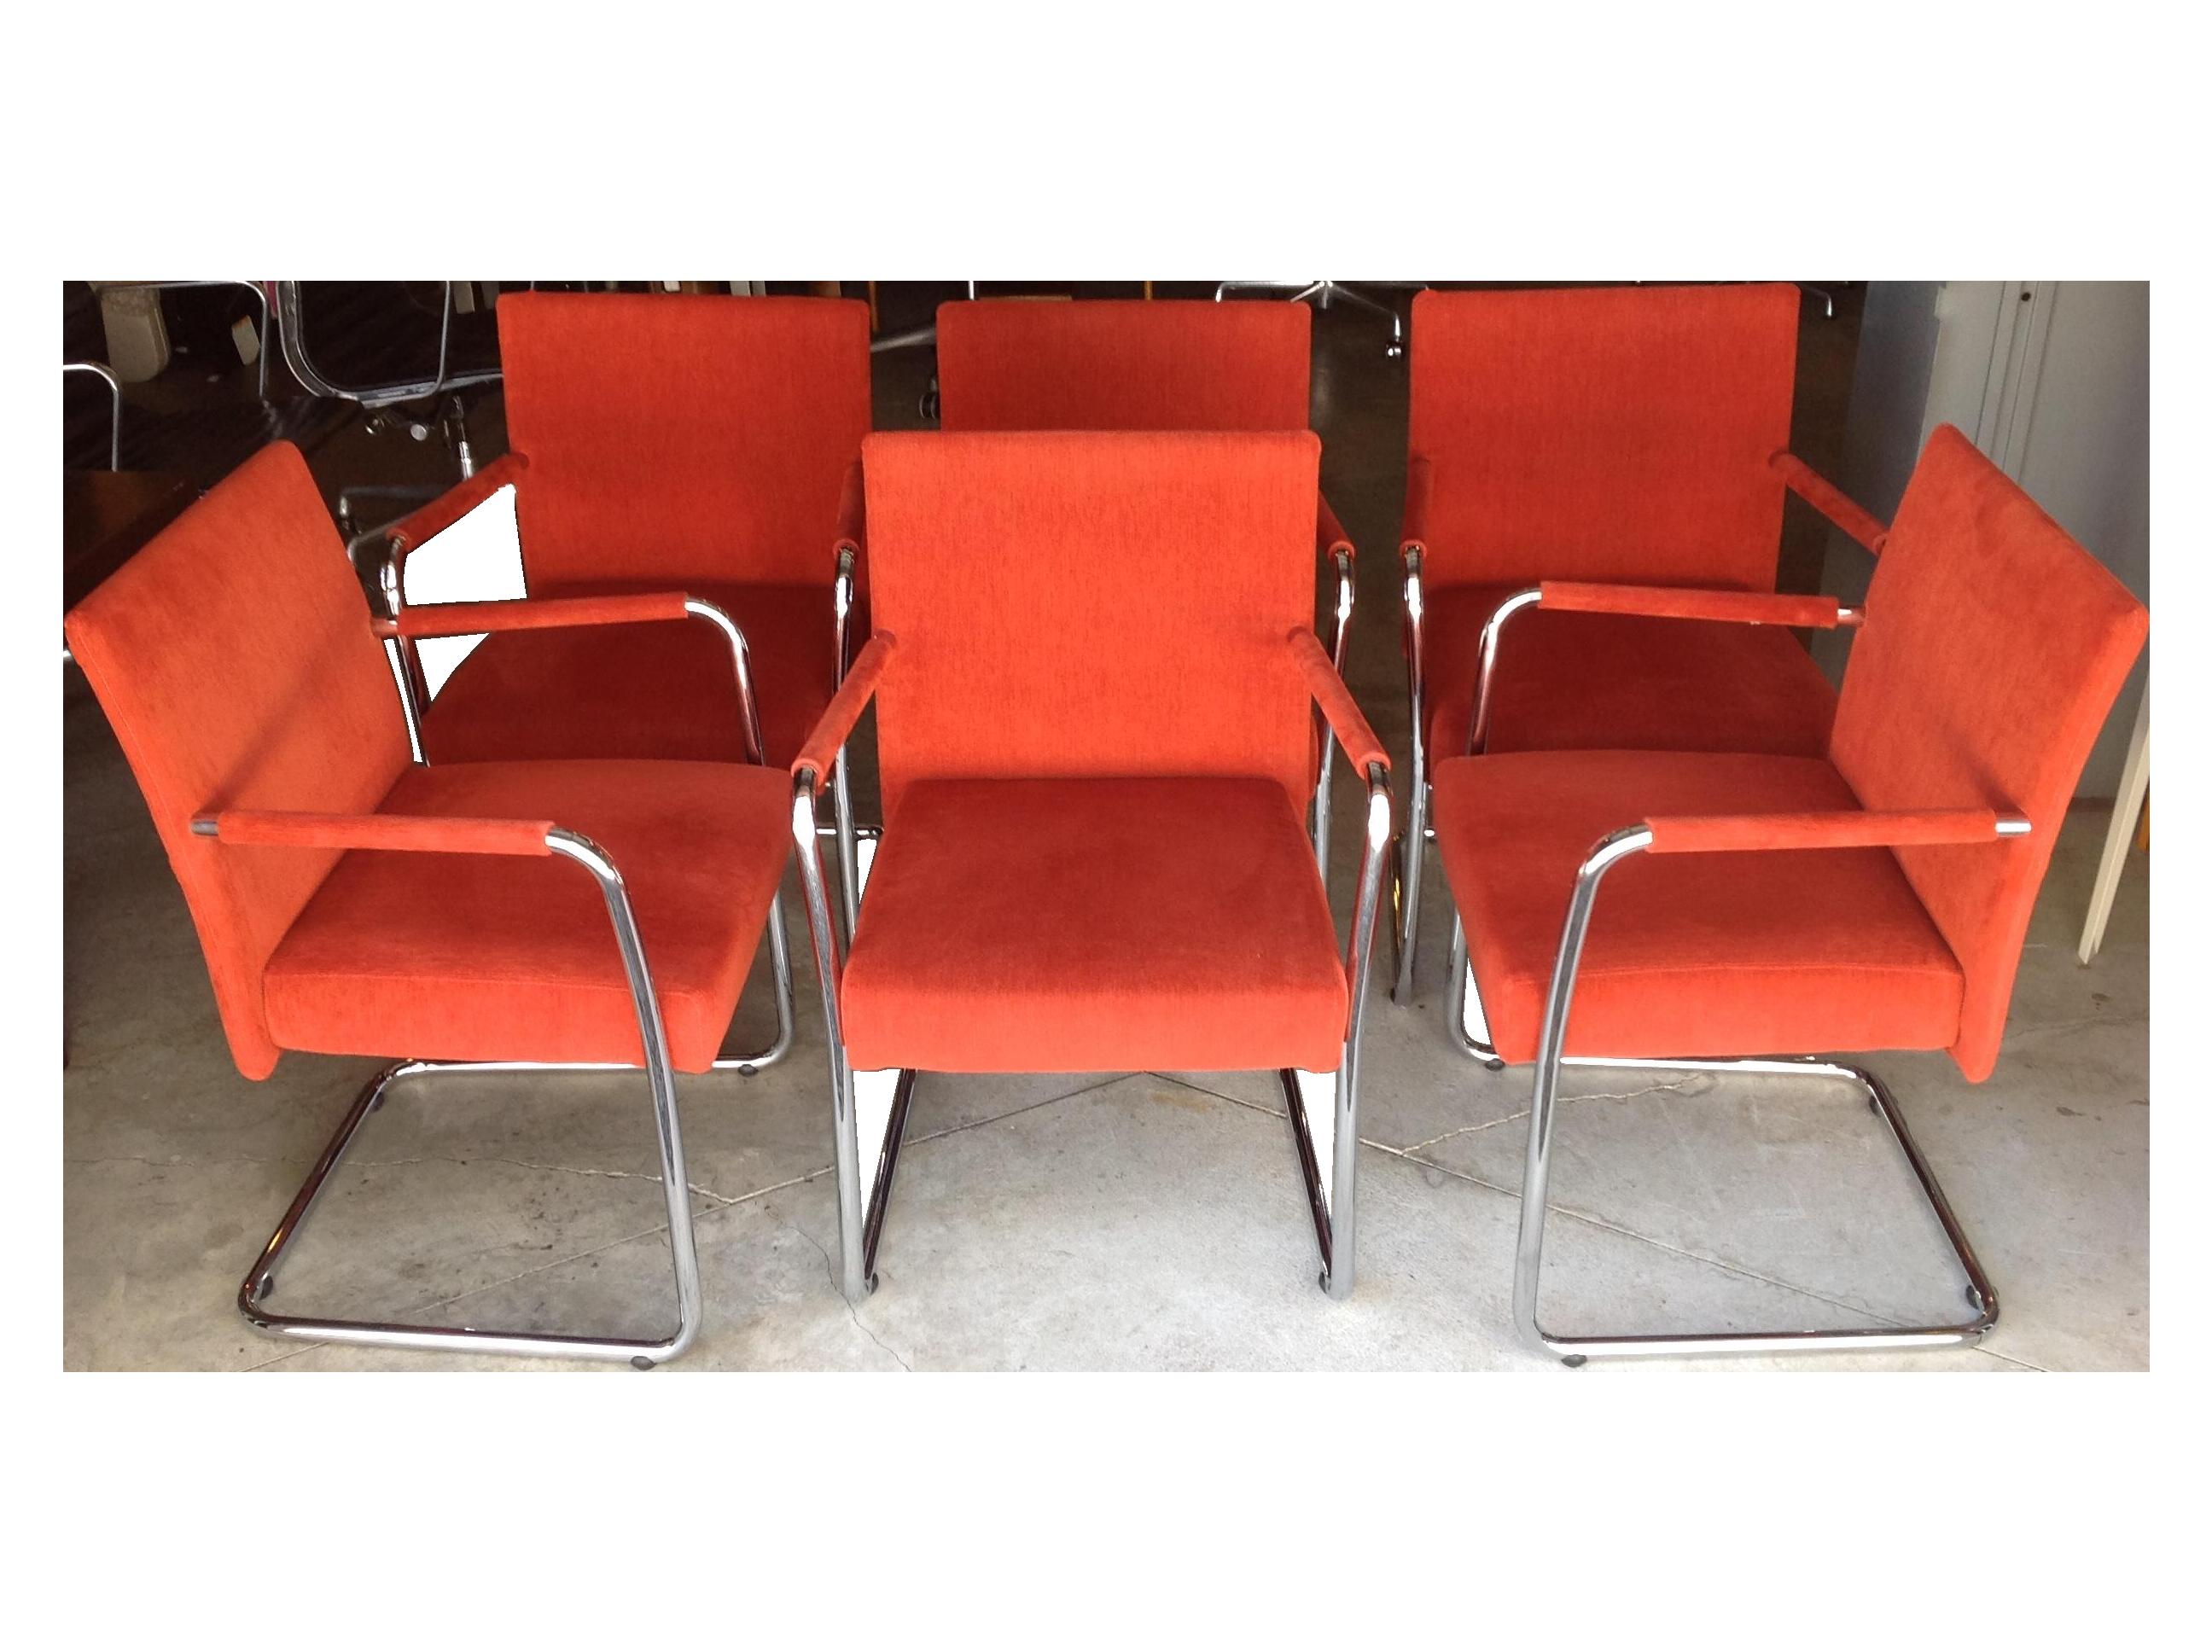 Beau Brayton International Dining Chairs   Set Of 6